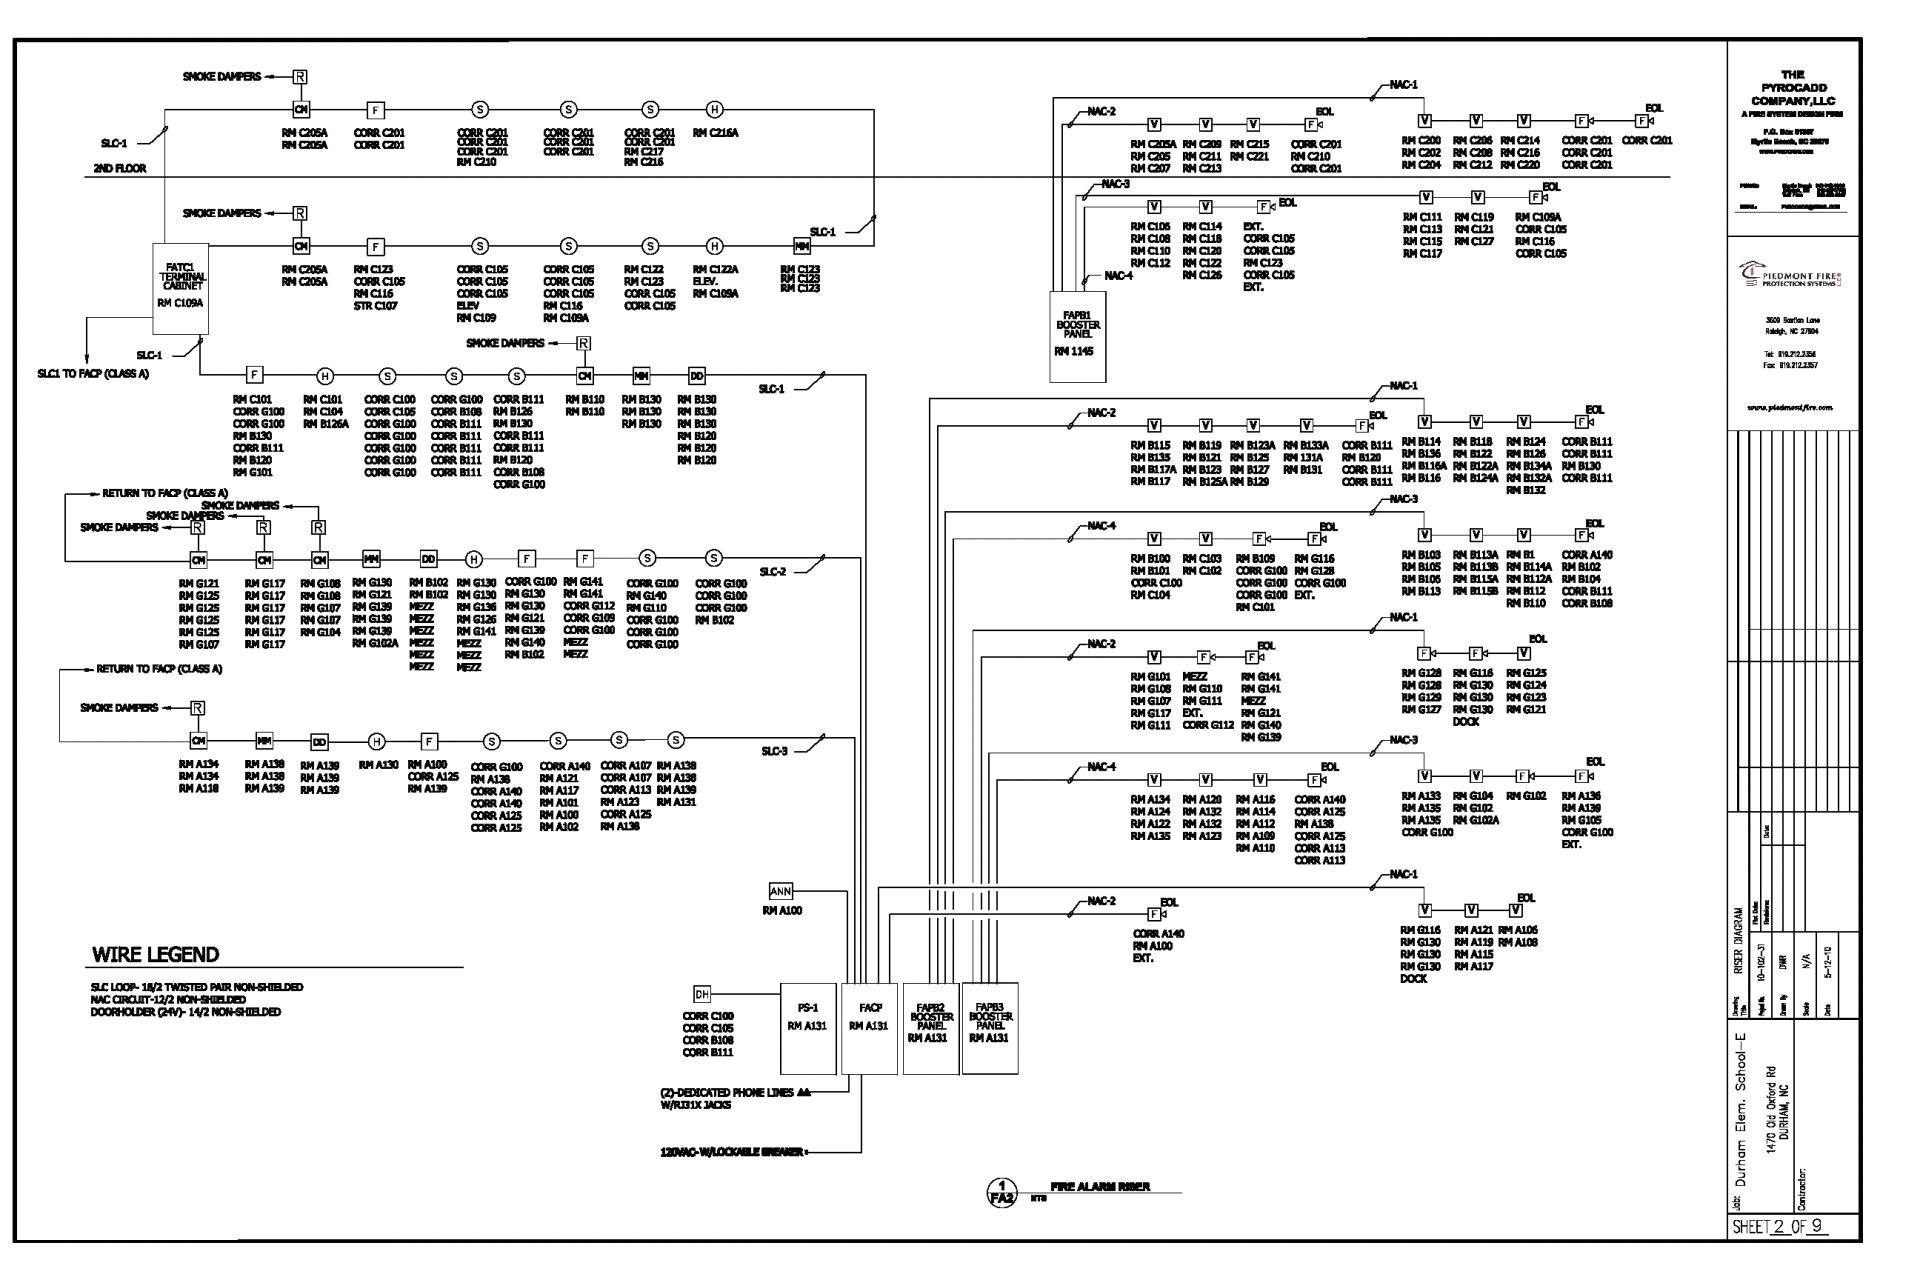 cics wiring diagram wiring diagram ebookcics wiring diagram index listing of wiring diagramscics wiring diagram data